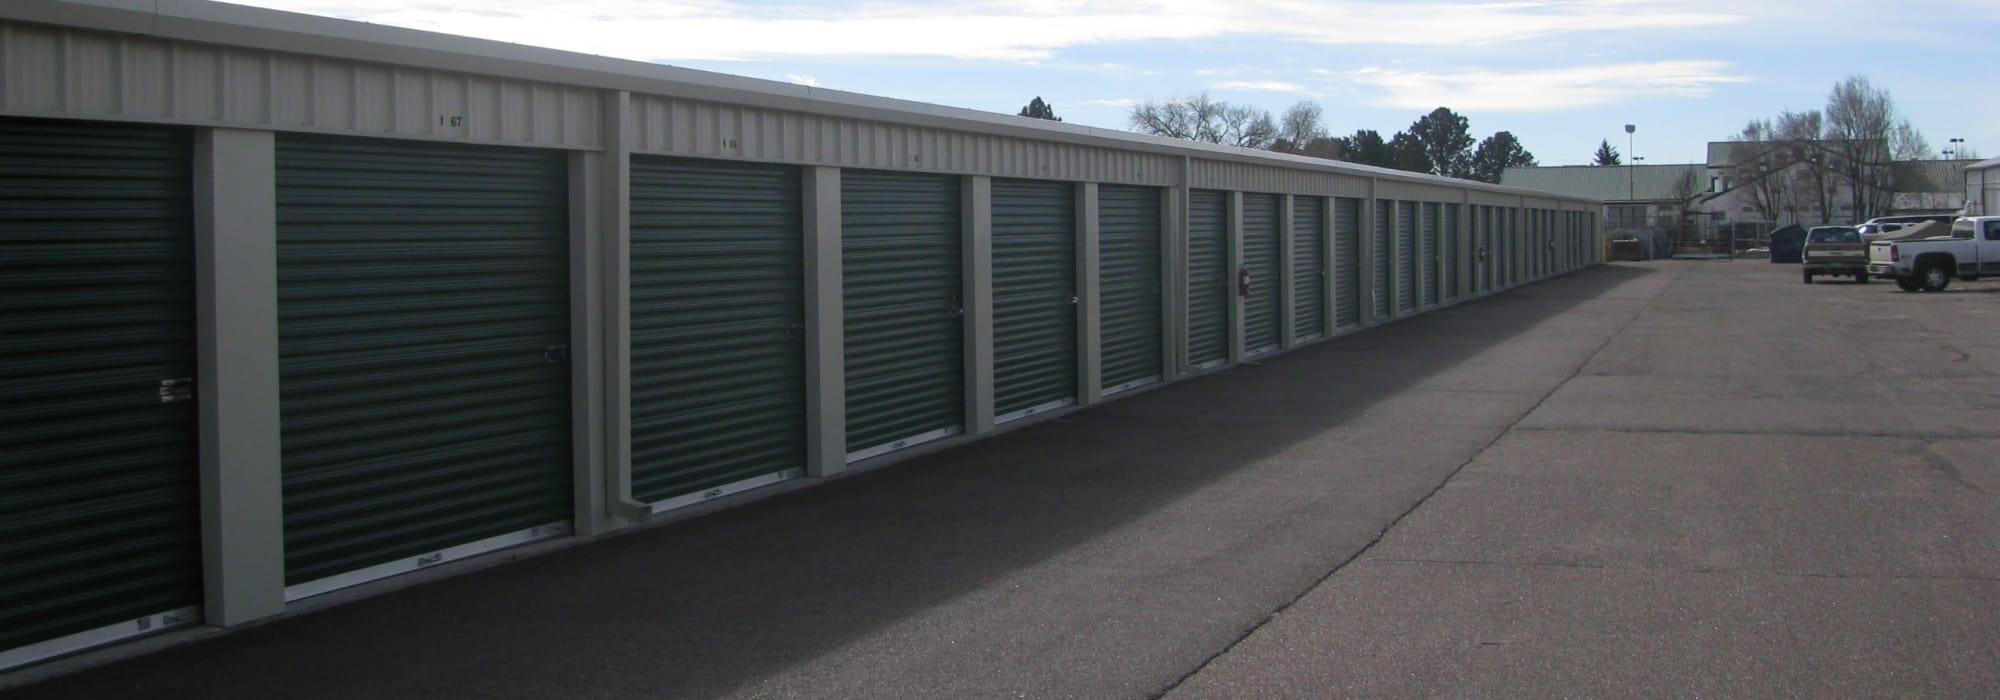 Self storage in Colorado Springs CO